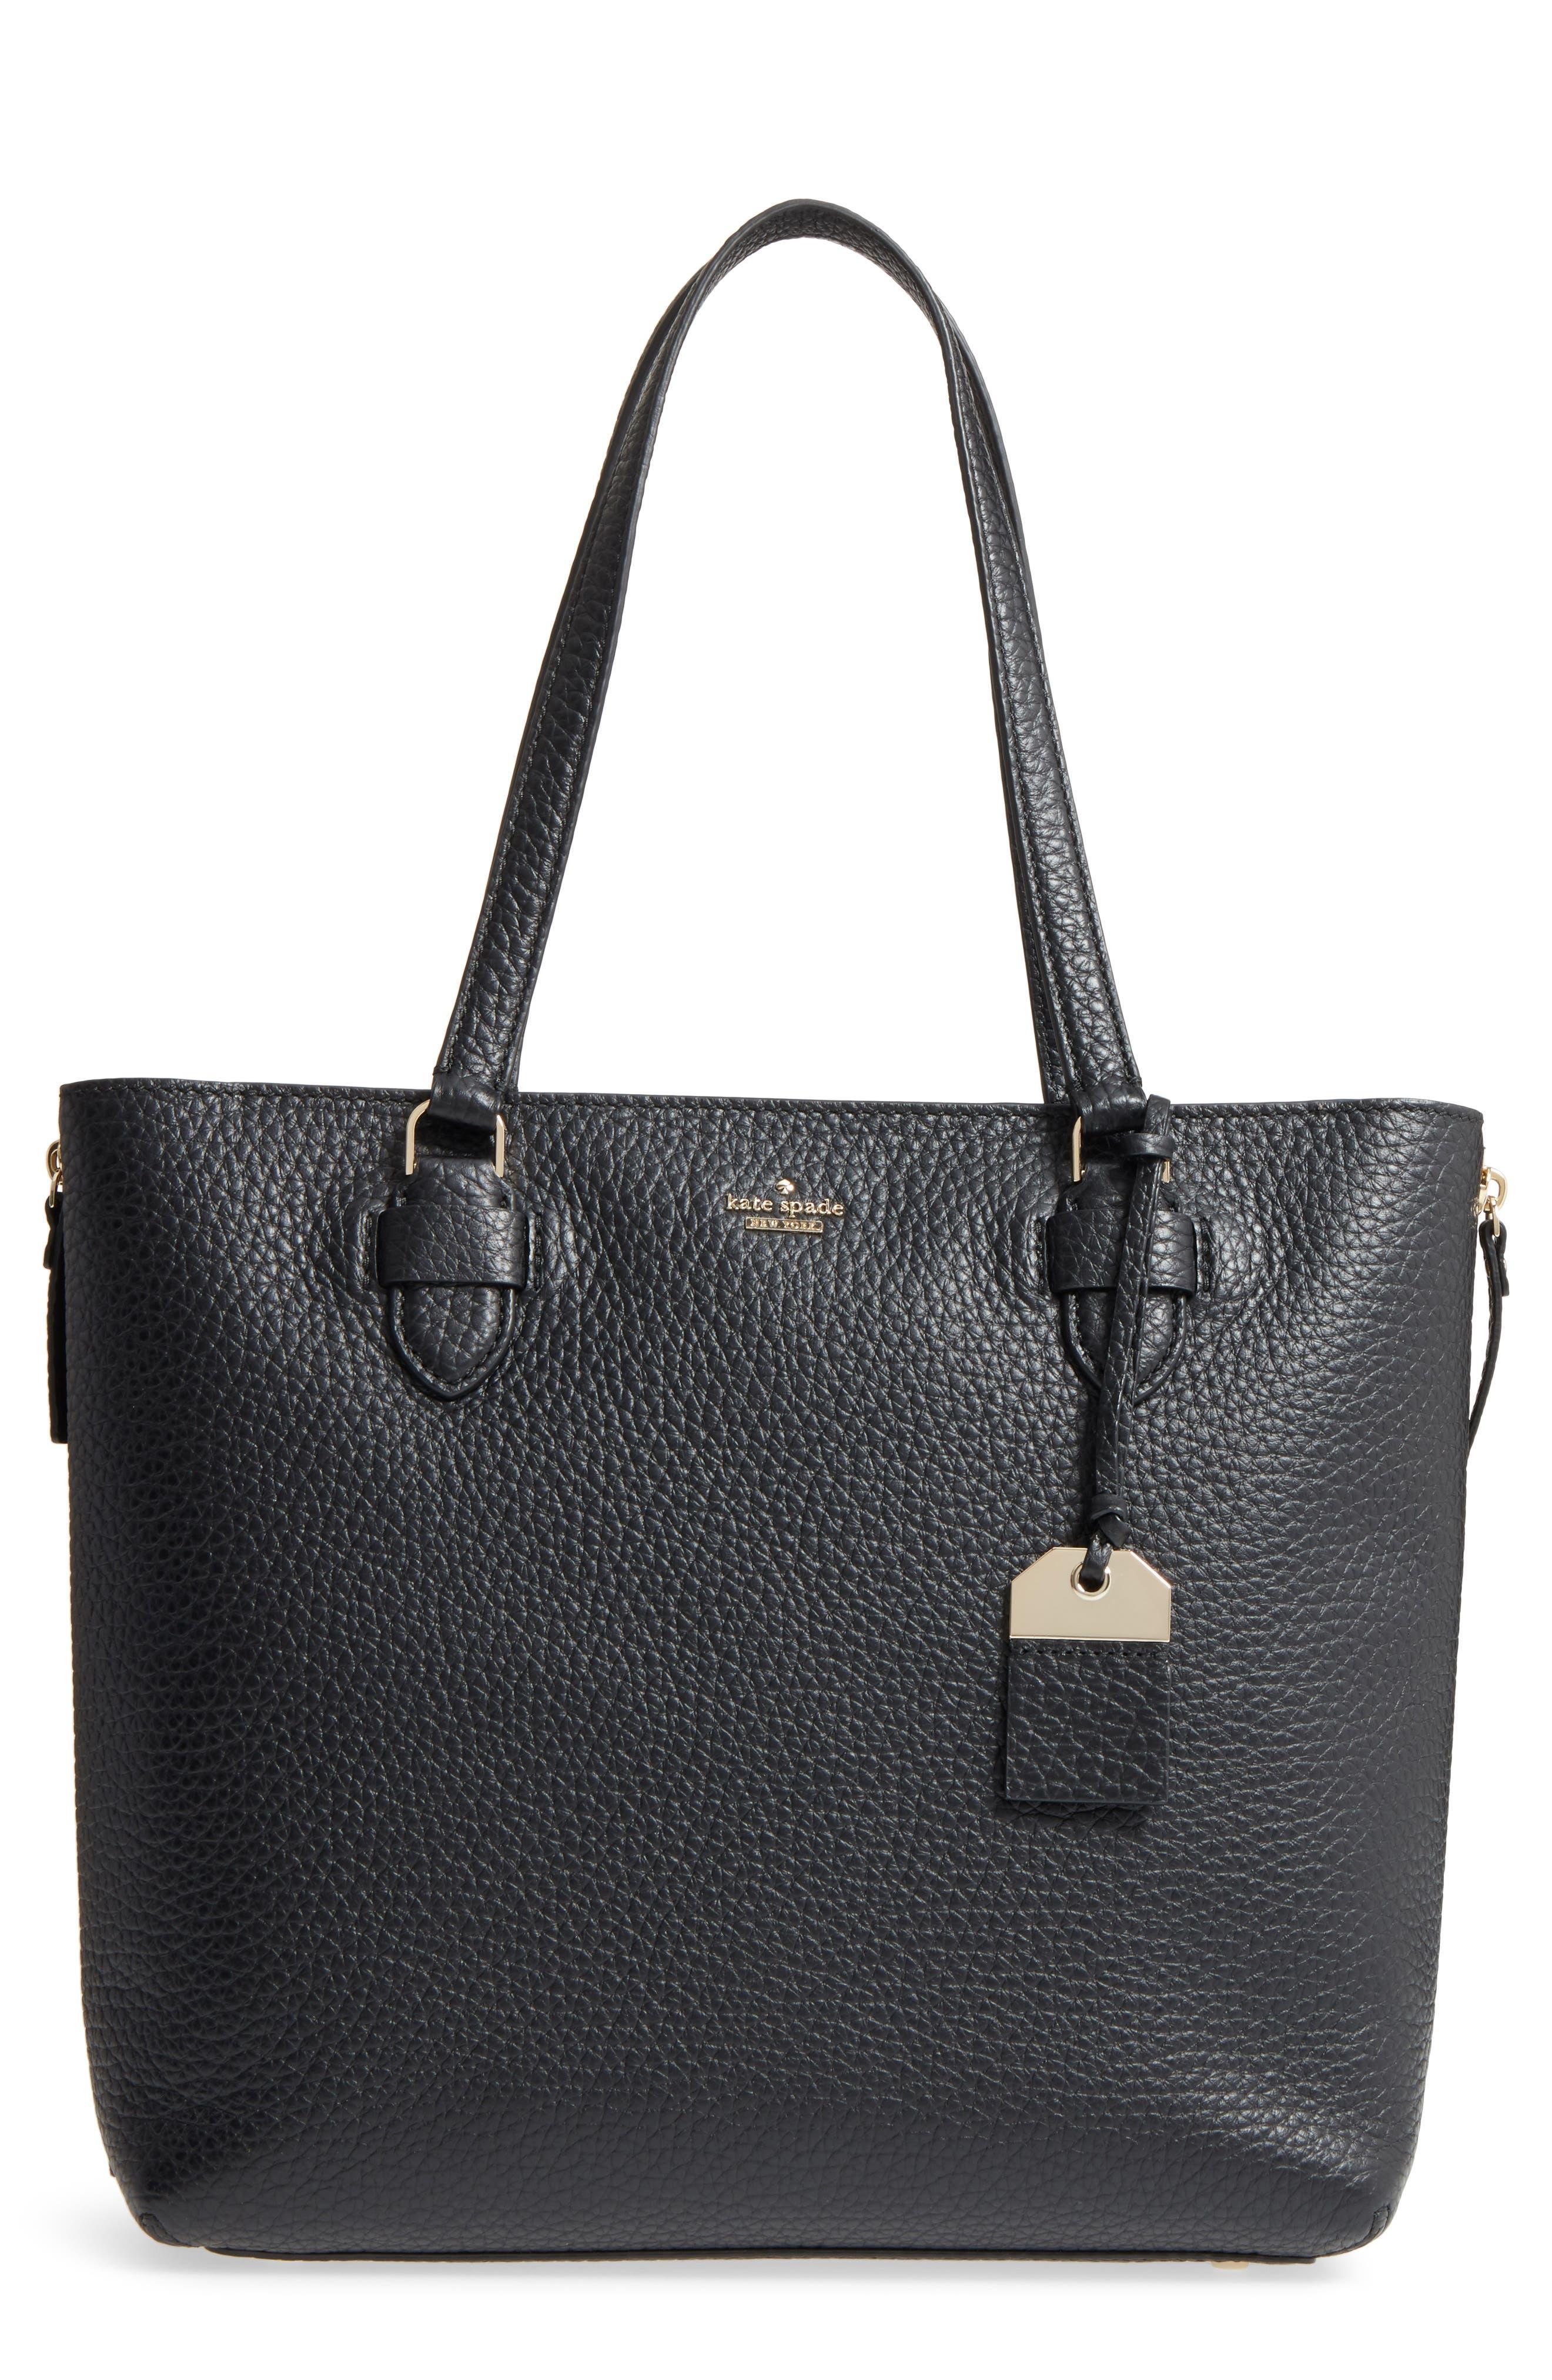 carter street - selena leather tote,                         Main,                         color, Black